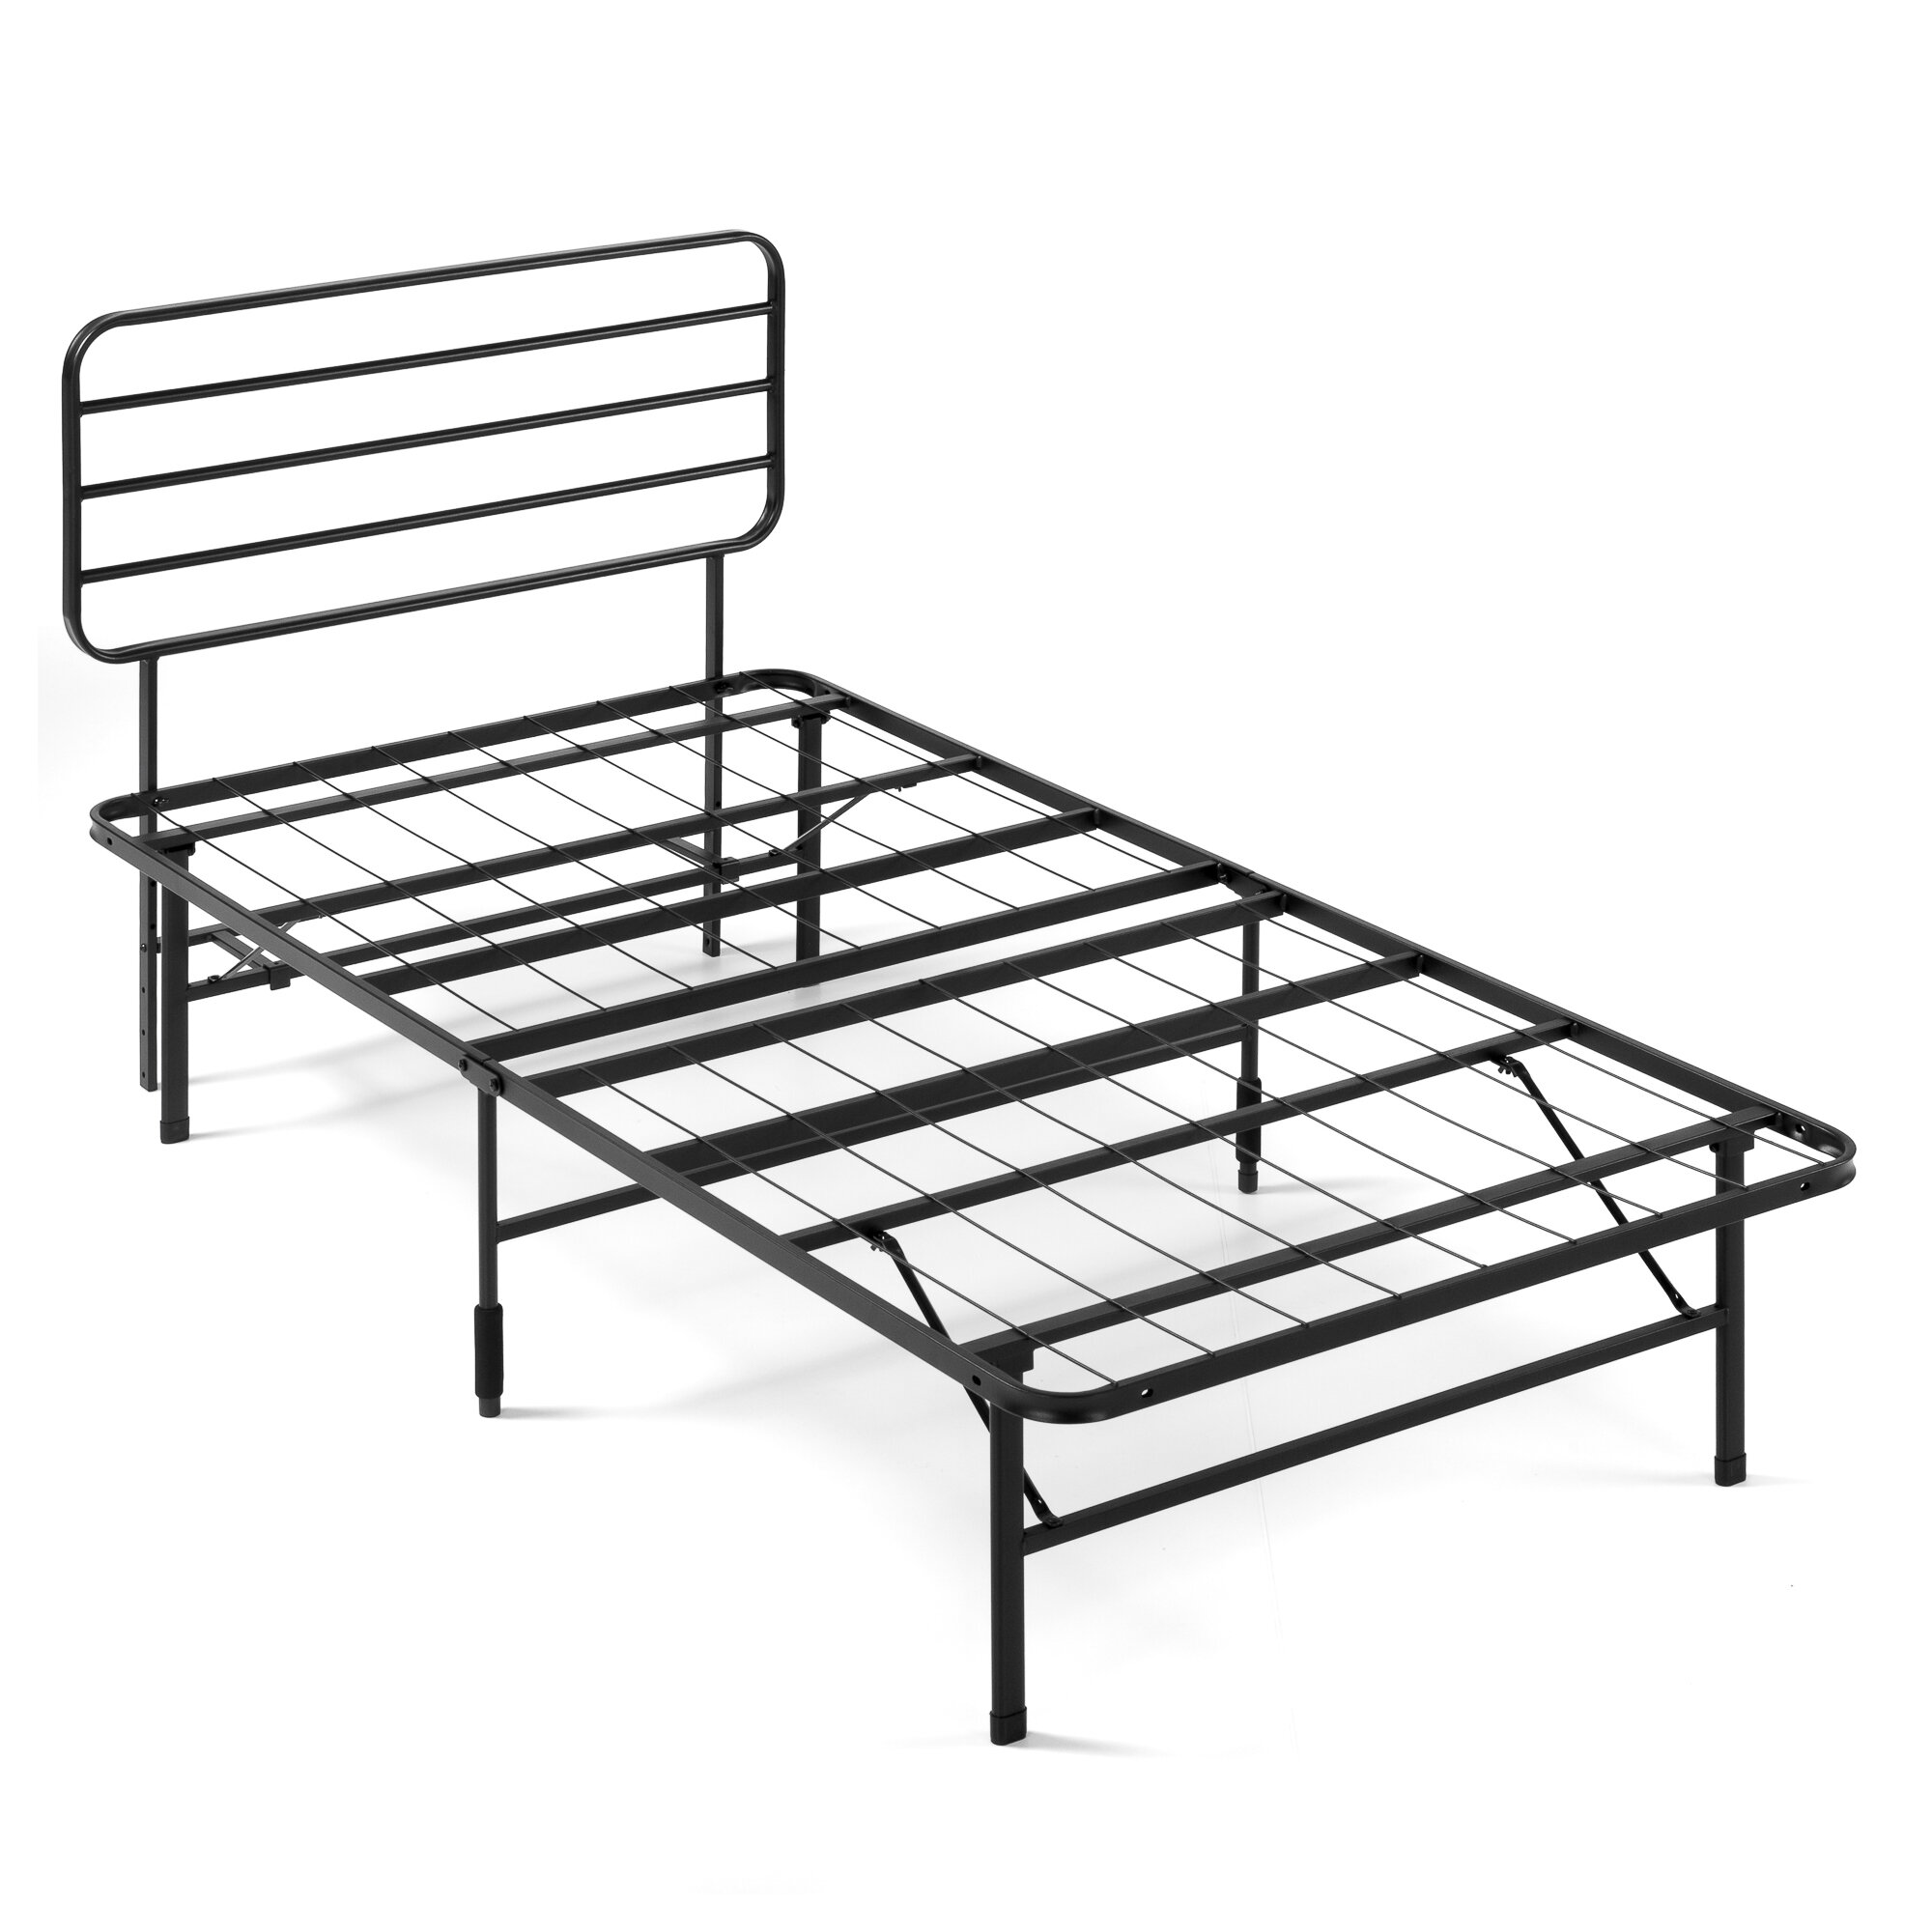 Alwyn Home Lorna 14 Smartbase Mattress Foundation With Headboard Metal Platform Bed Frame Reviews Wayfair